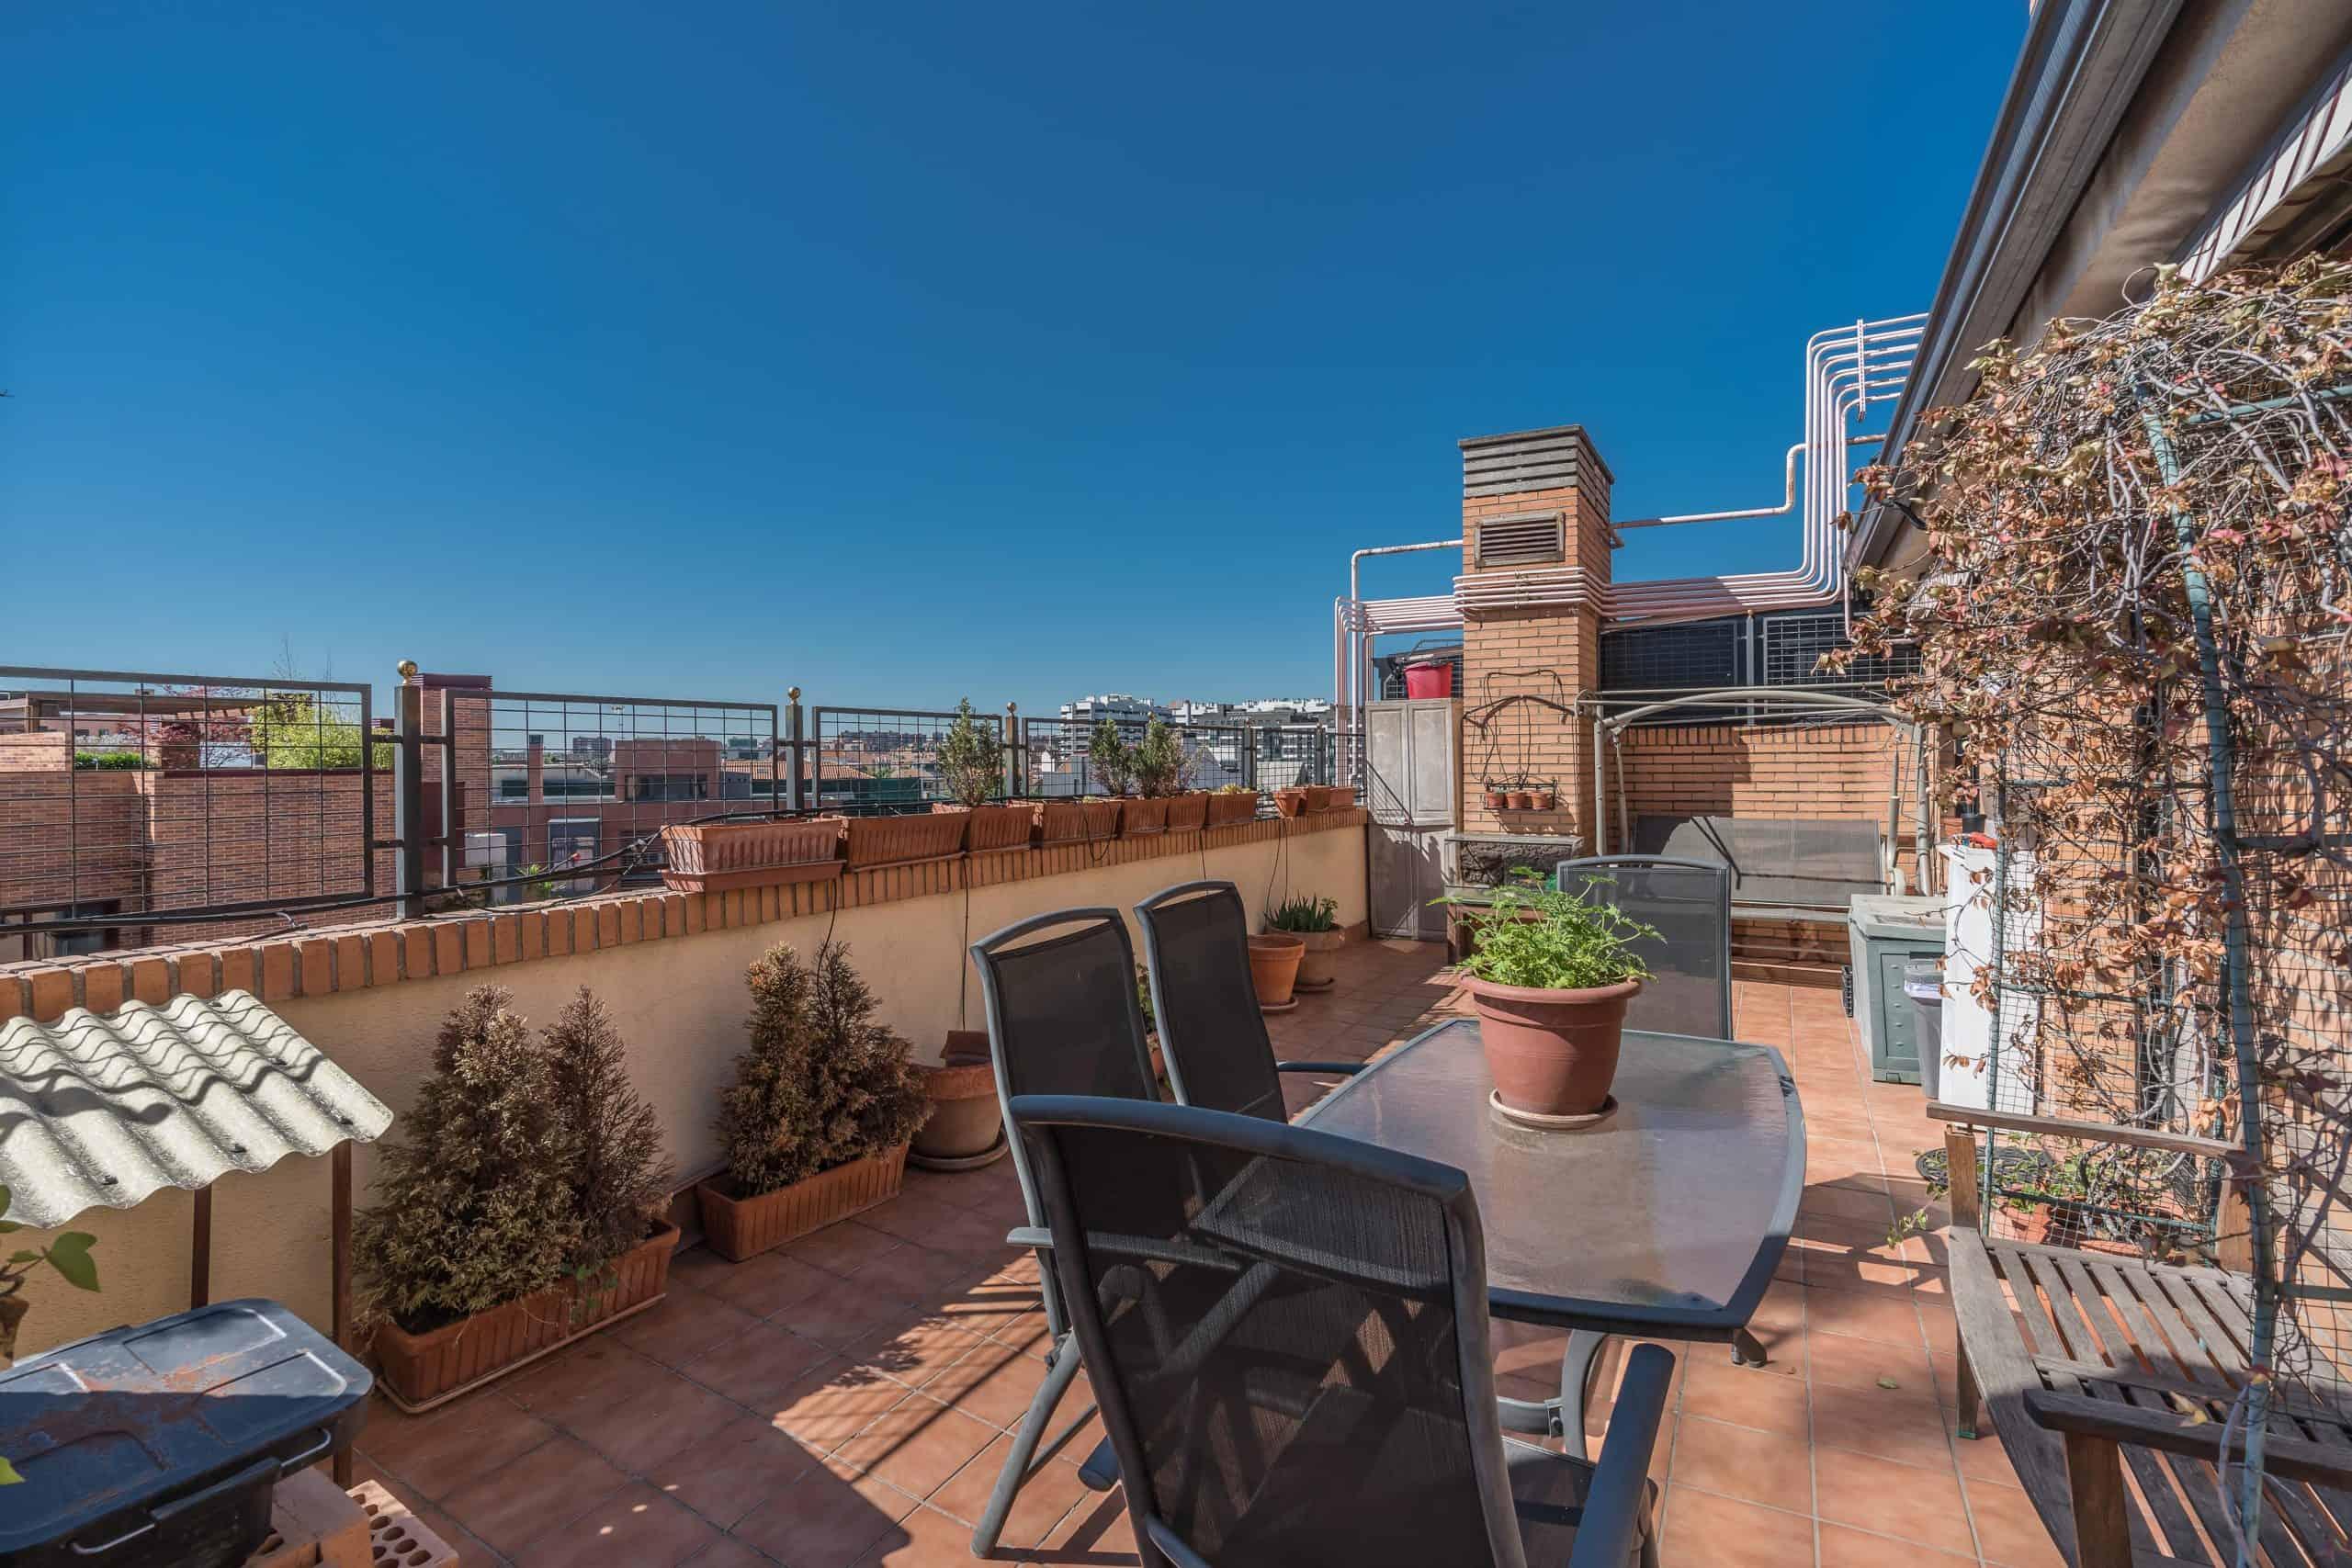 Agencia Inmobiliaria de Madrid-FUTUROCASA-Zona ARGANZUELA-EMBAJADORES-LEGAZPI2 TERRAZA (3)